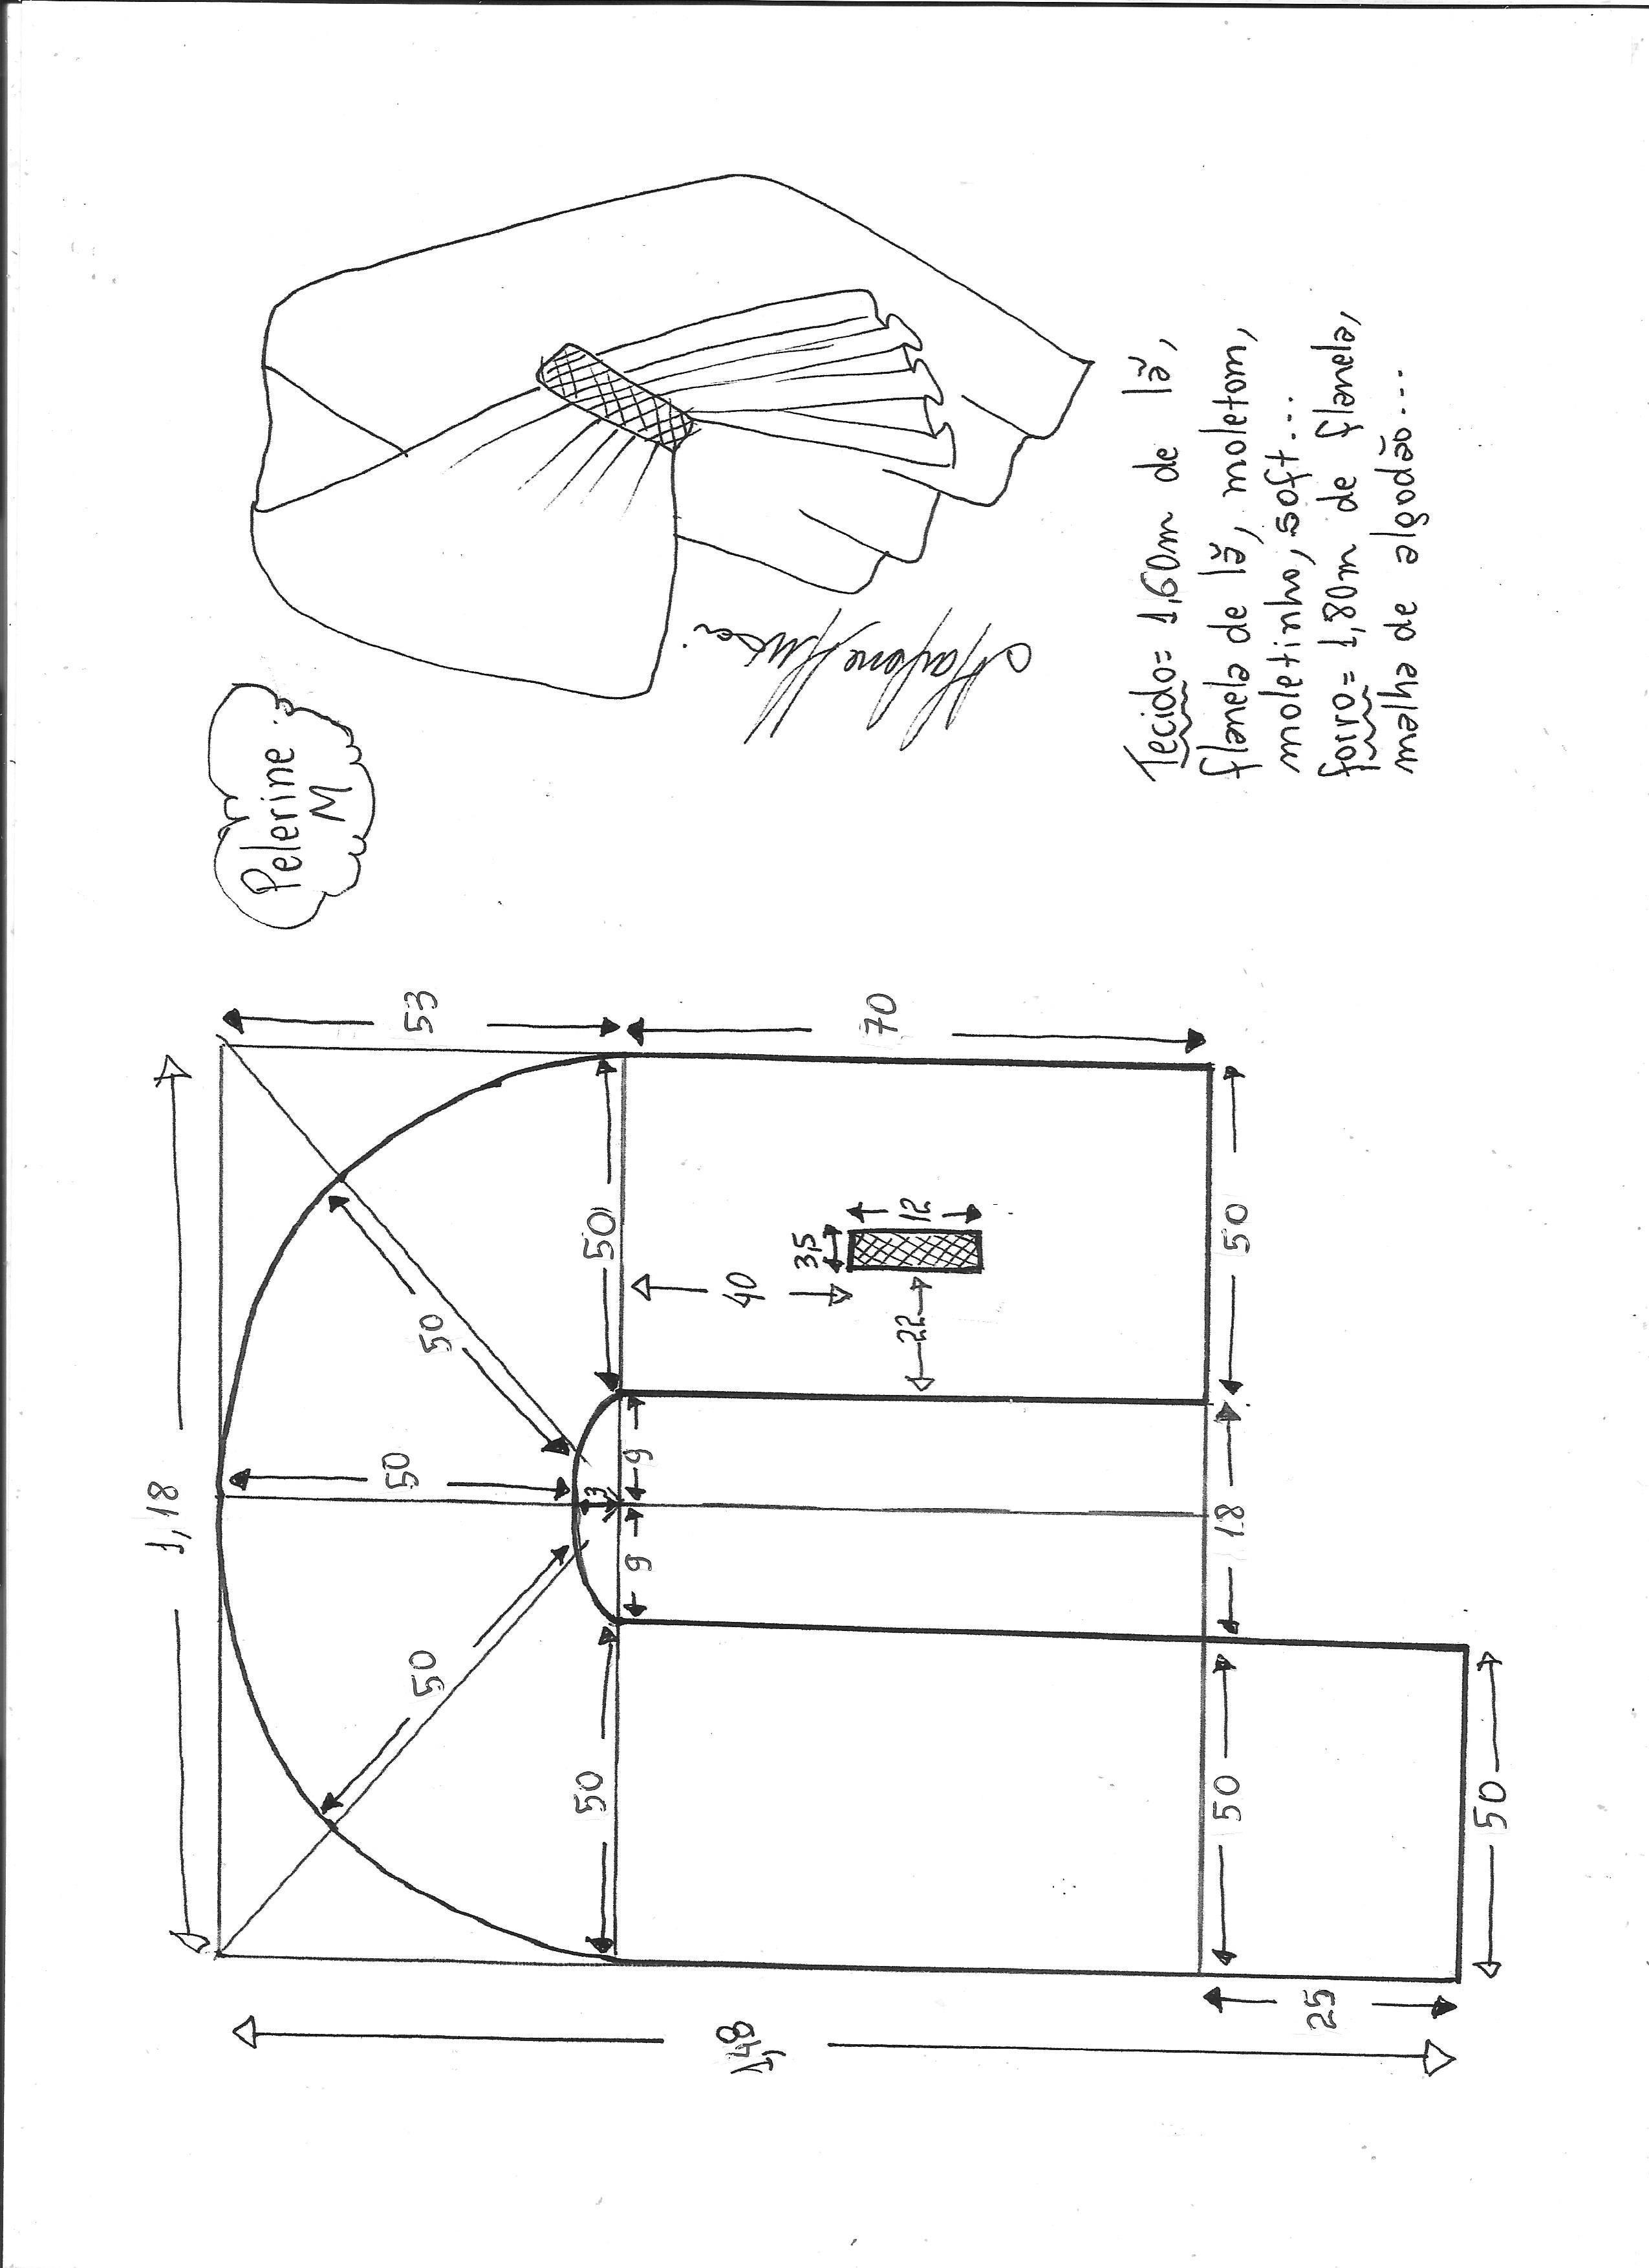 Pin de Houssem Boukhalfa en patron | Pinterest | Ideas de moda ...